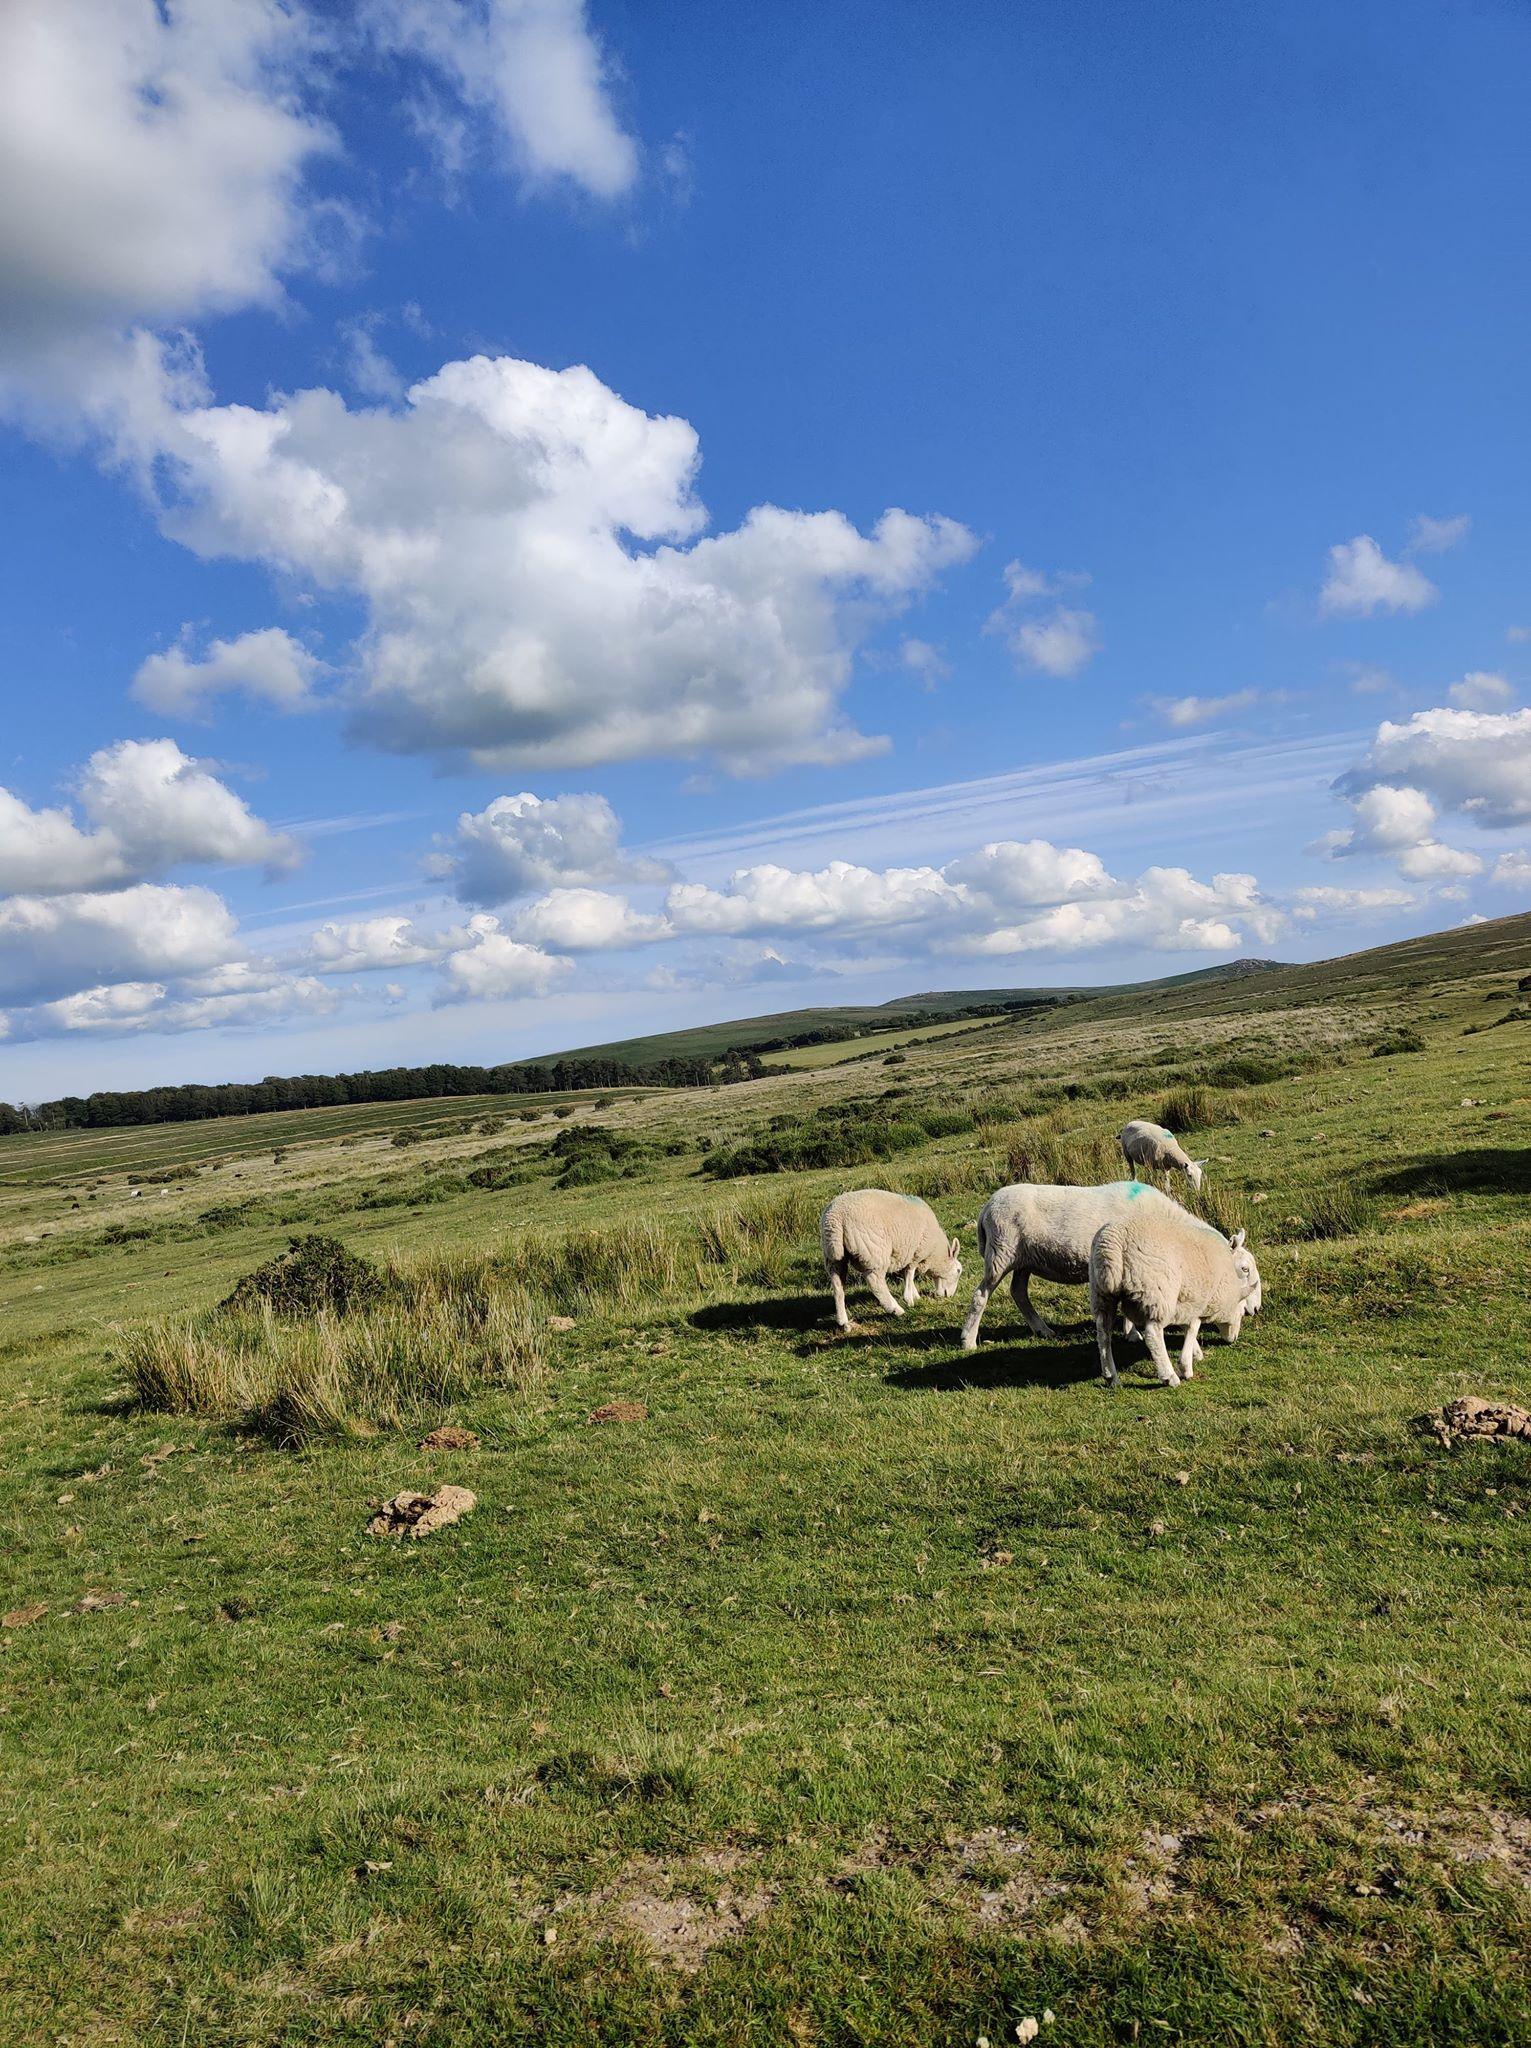 18 sheep